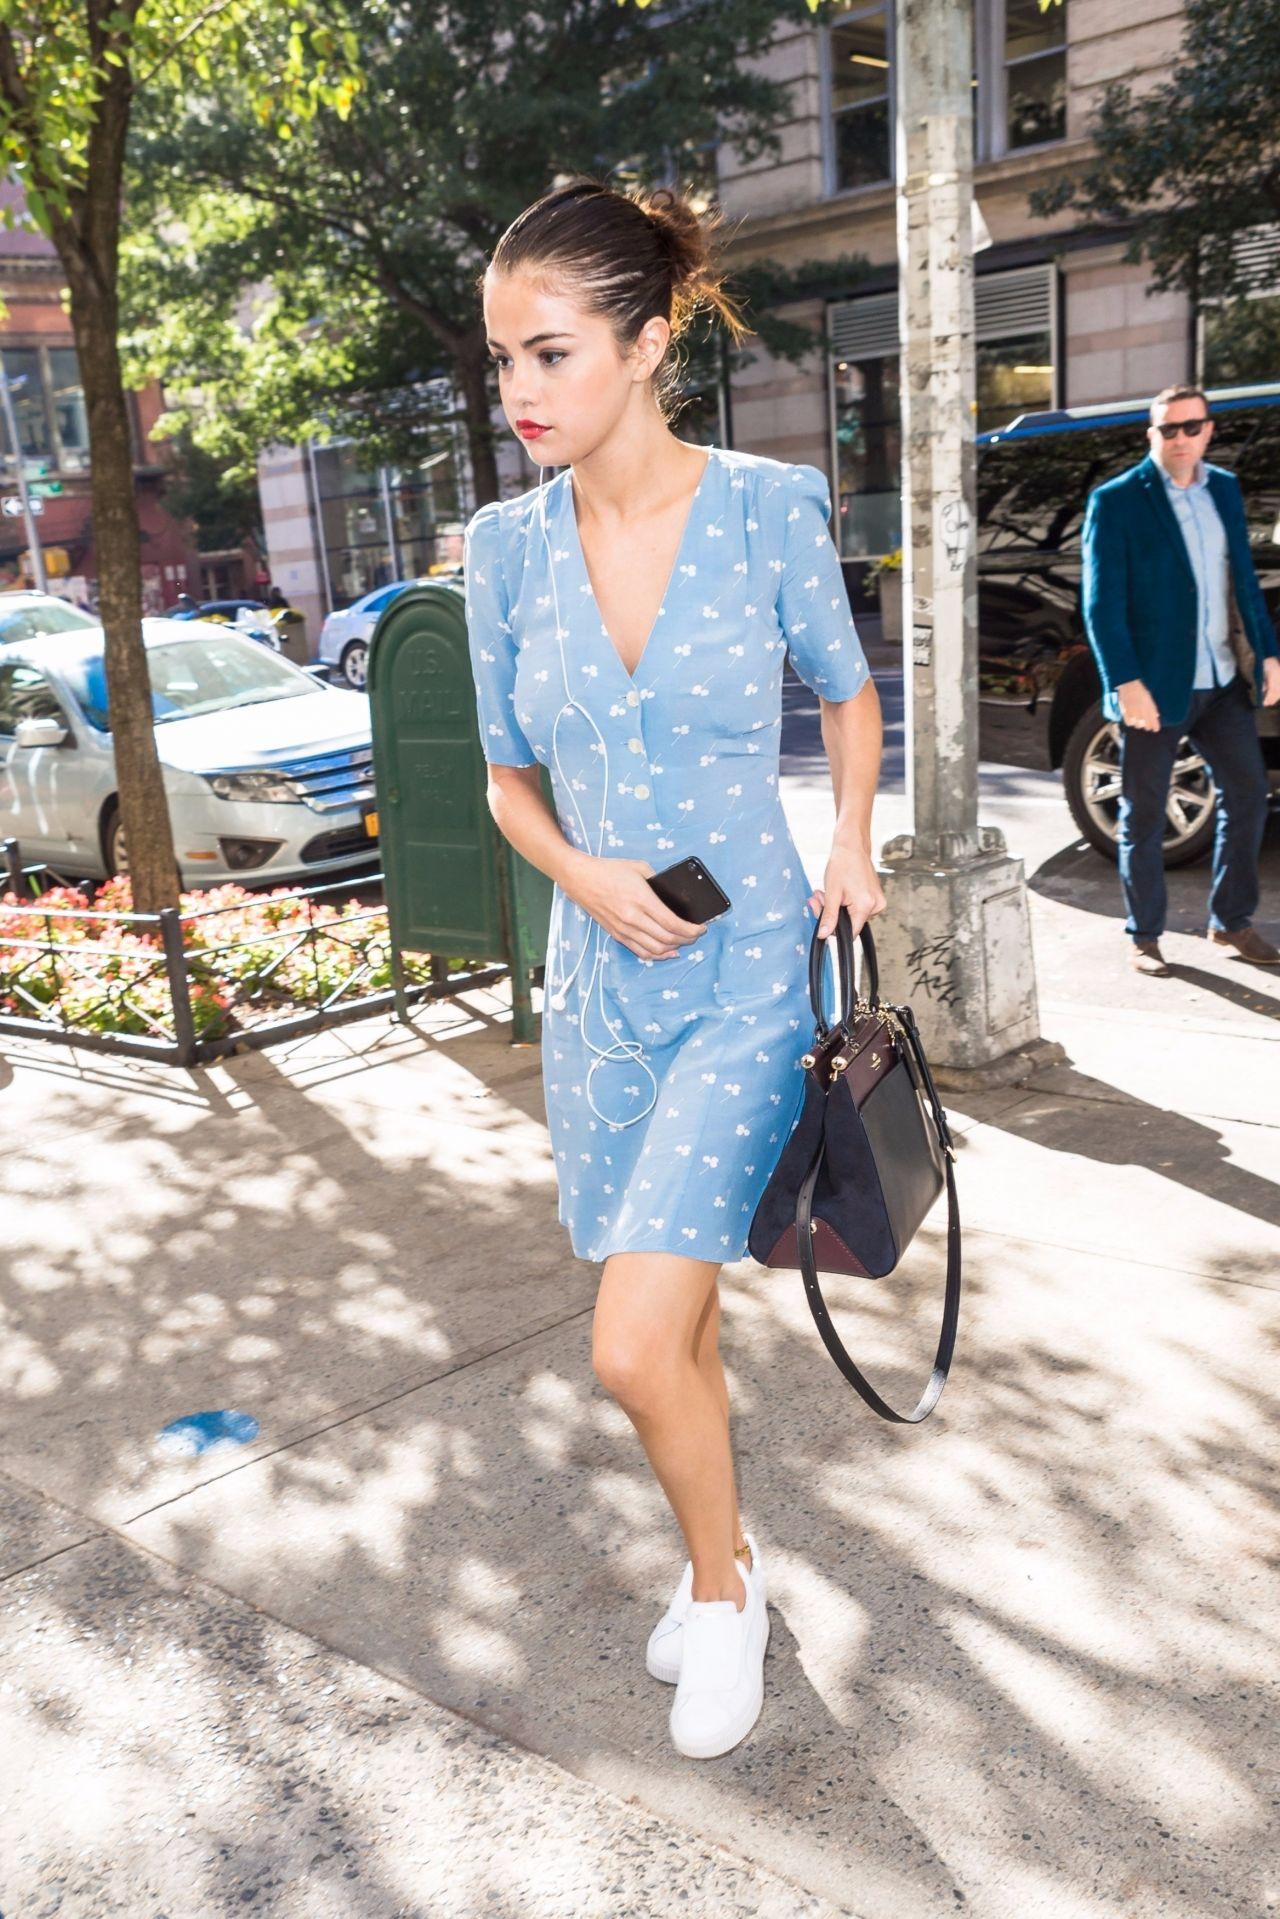 Selena Gomez in Blue Summer Dress in NYC